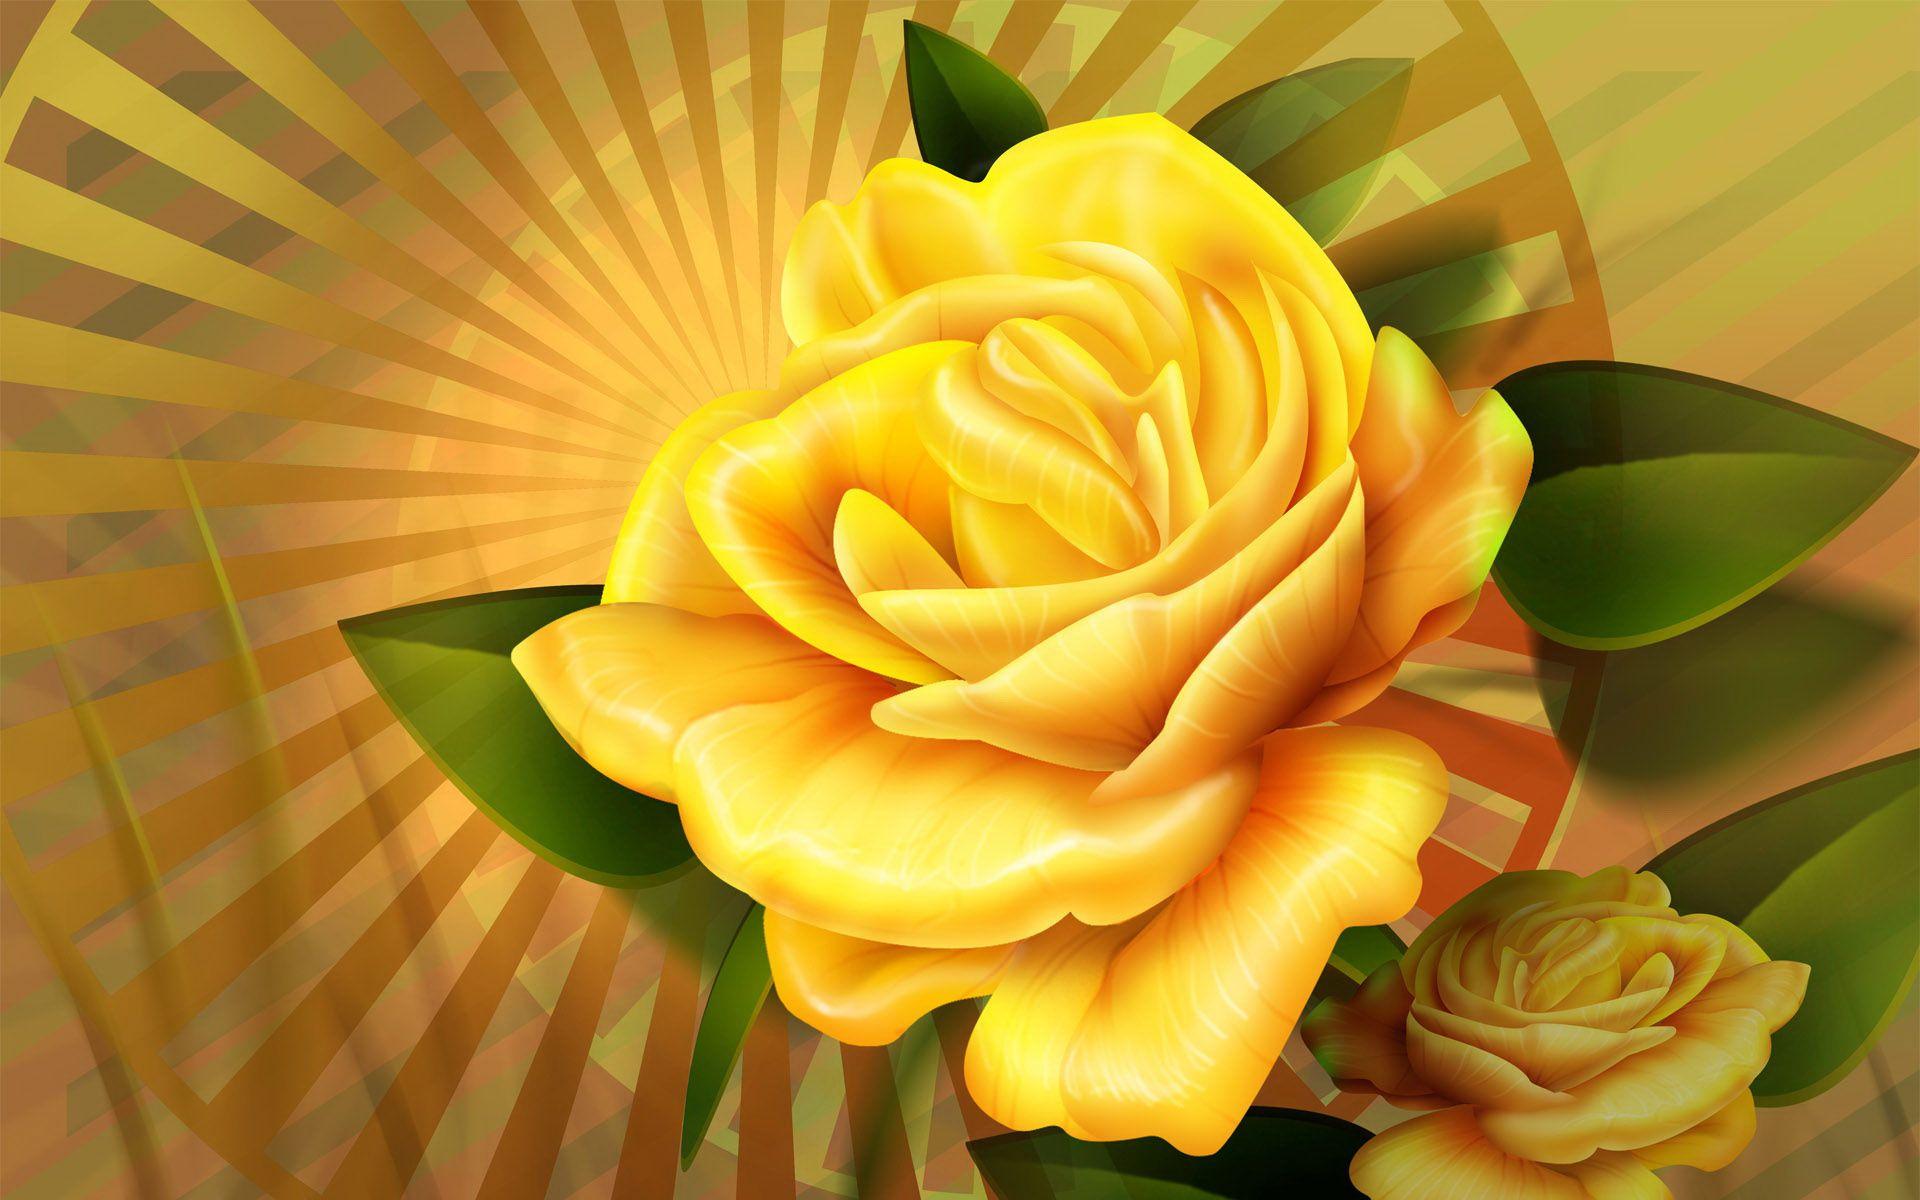 Free desktop wallpaper, desktop background 1920×1200 Yellow Desktop Backgrounds (36 Wallpapers) | Adorable Wallpapers